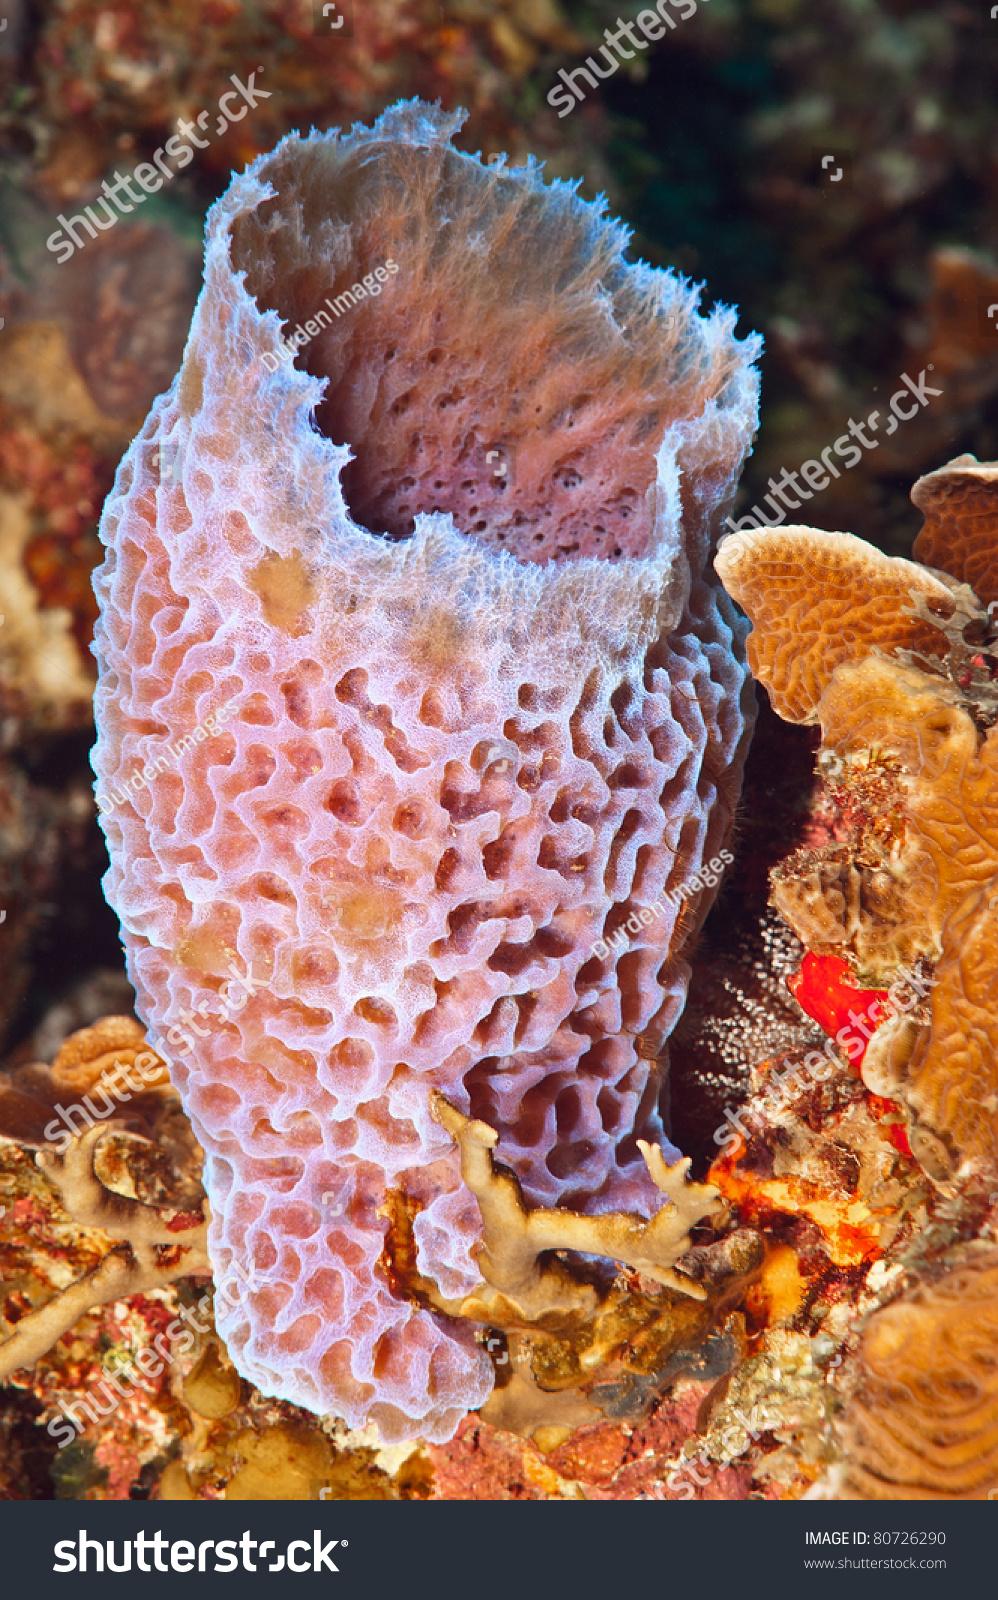 Azure vase sponge callyspongia plicifera pinkpurple stock photo azure vase sponge callyspongia plicifera a pinkpurple vase like sponge that reviewsmspy